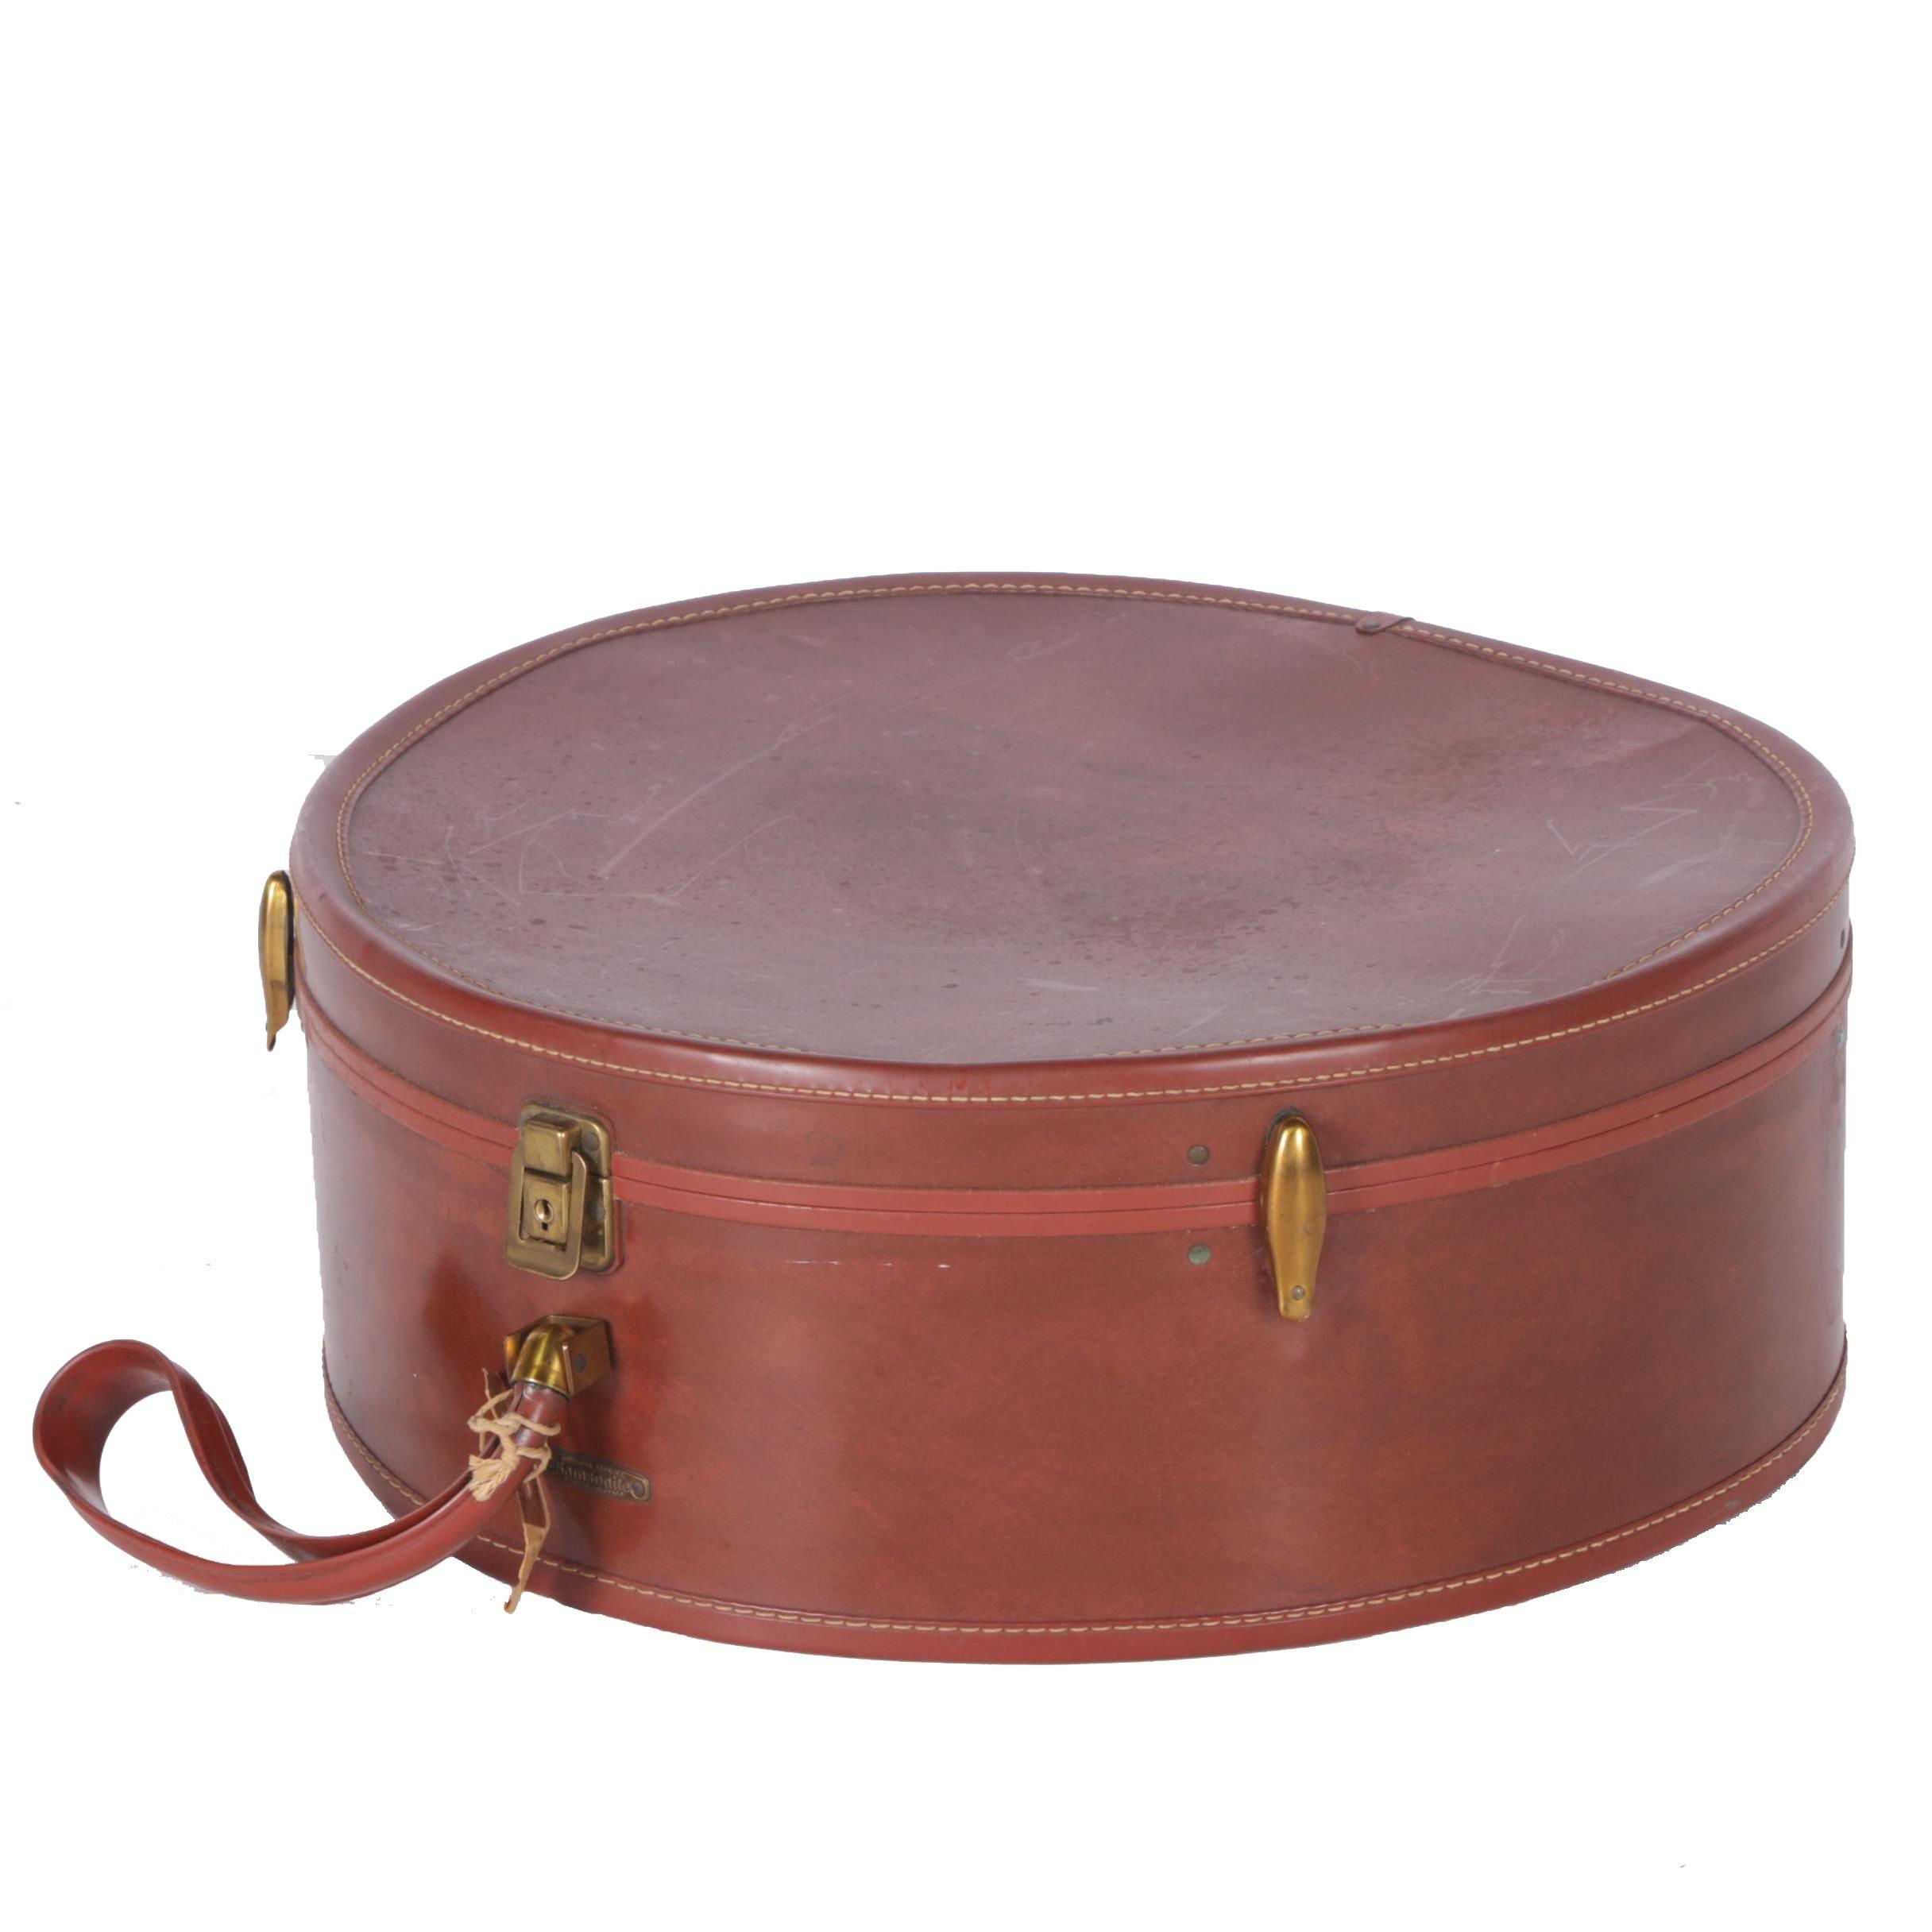 Circa 1960s Vintage Samsonite Luggage Hat Box Train Case